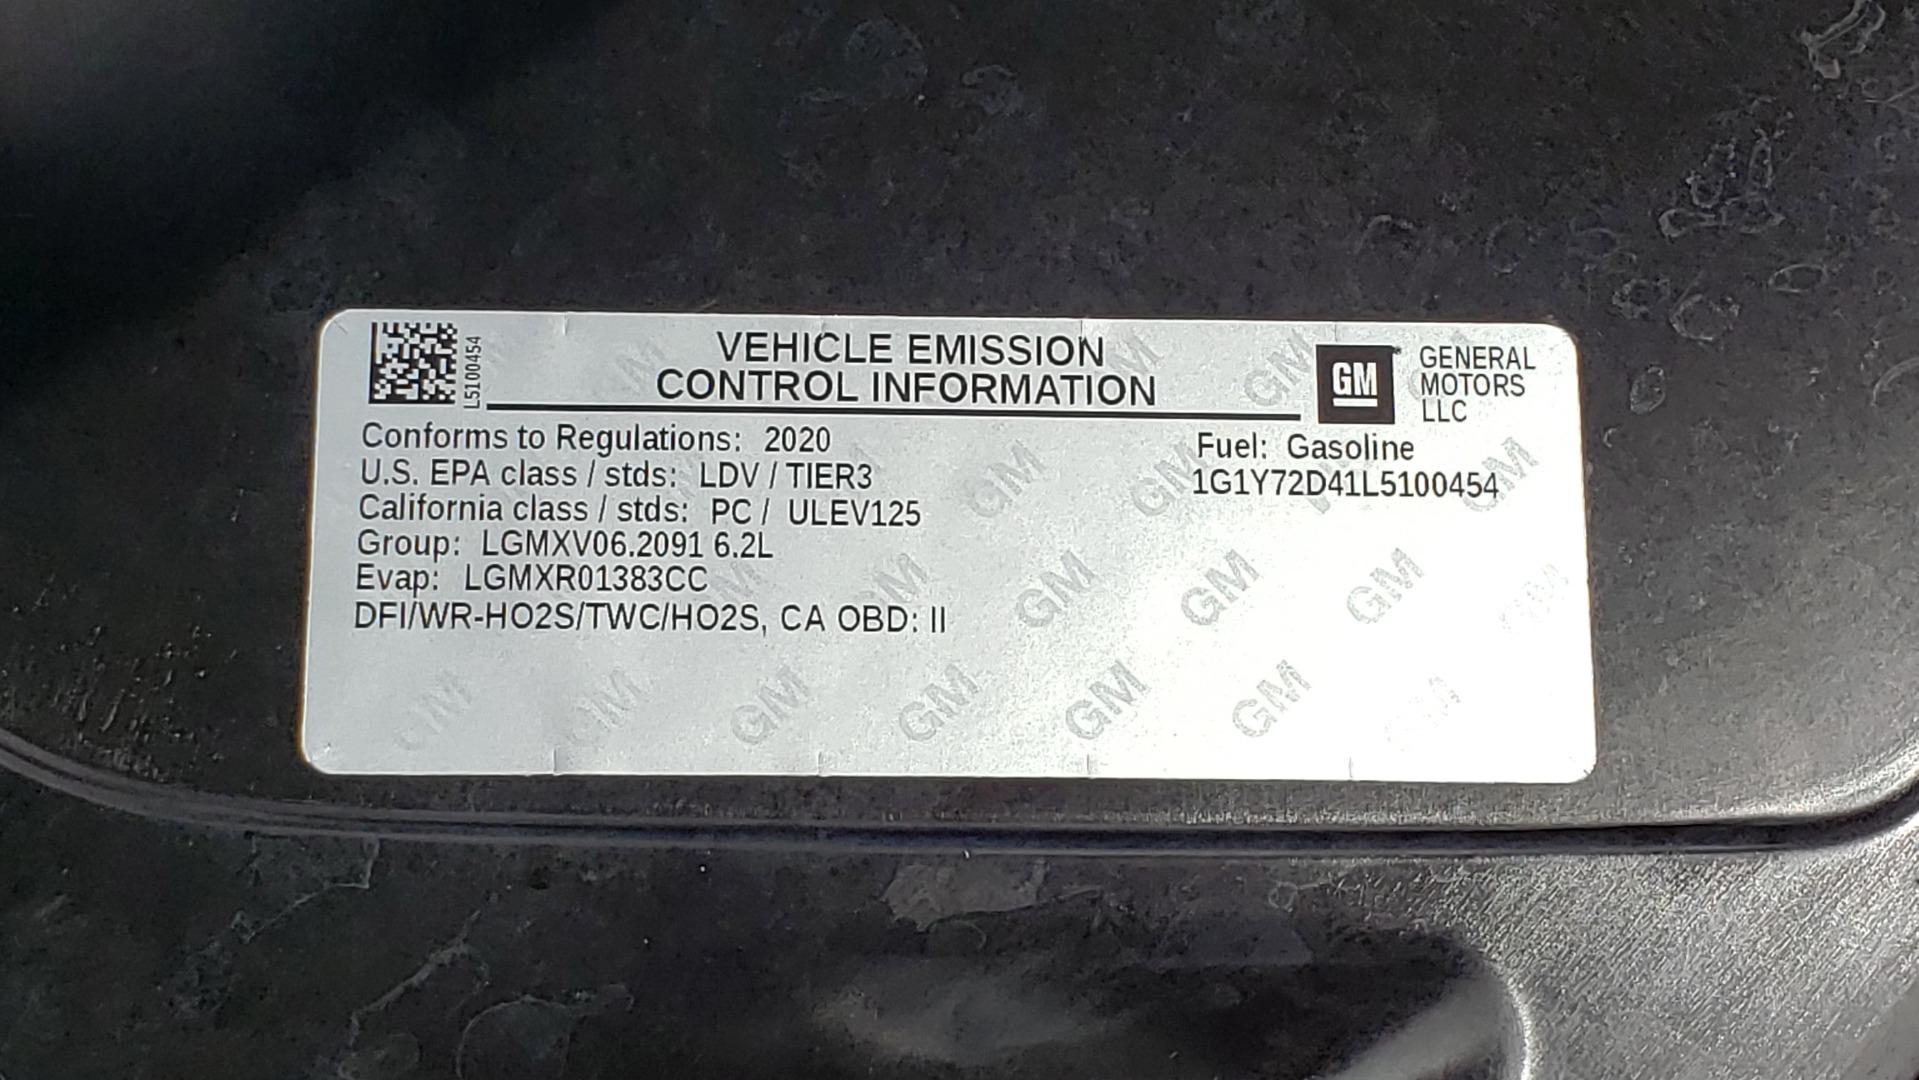 Used 2020 Chevrolet CORVETTE C8 STINGRAY 2LT / 6.2L V8 / 8-SPD AUTO / NAV / BOSE / REARVIEW / DATA RECOR for sale Sold at Formula Imports in Charlotte NC 28227 22